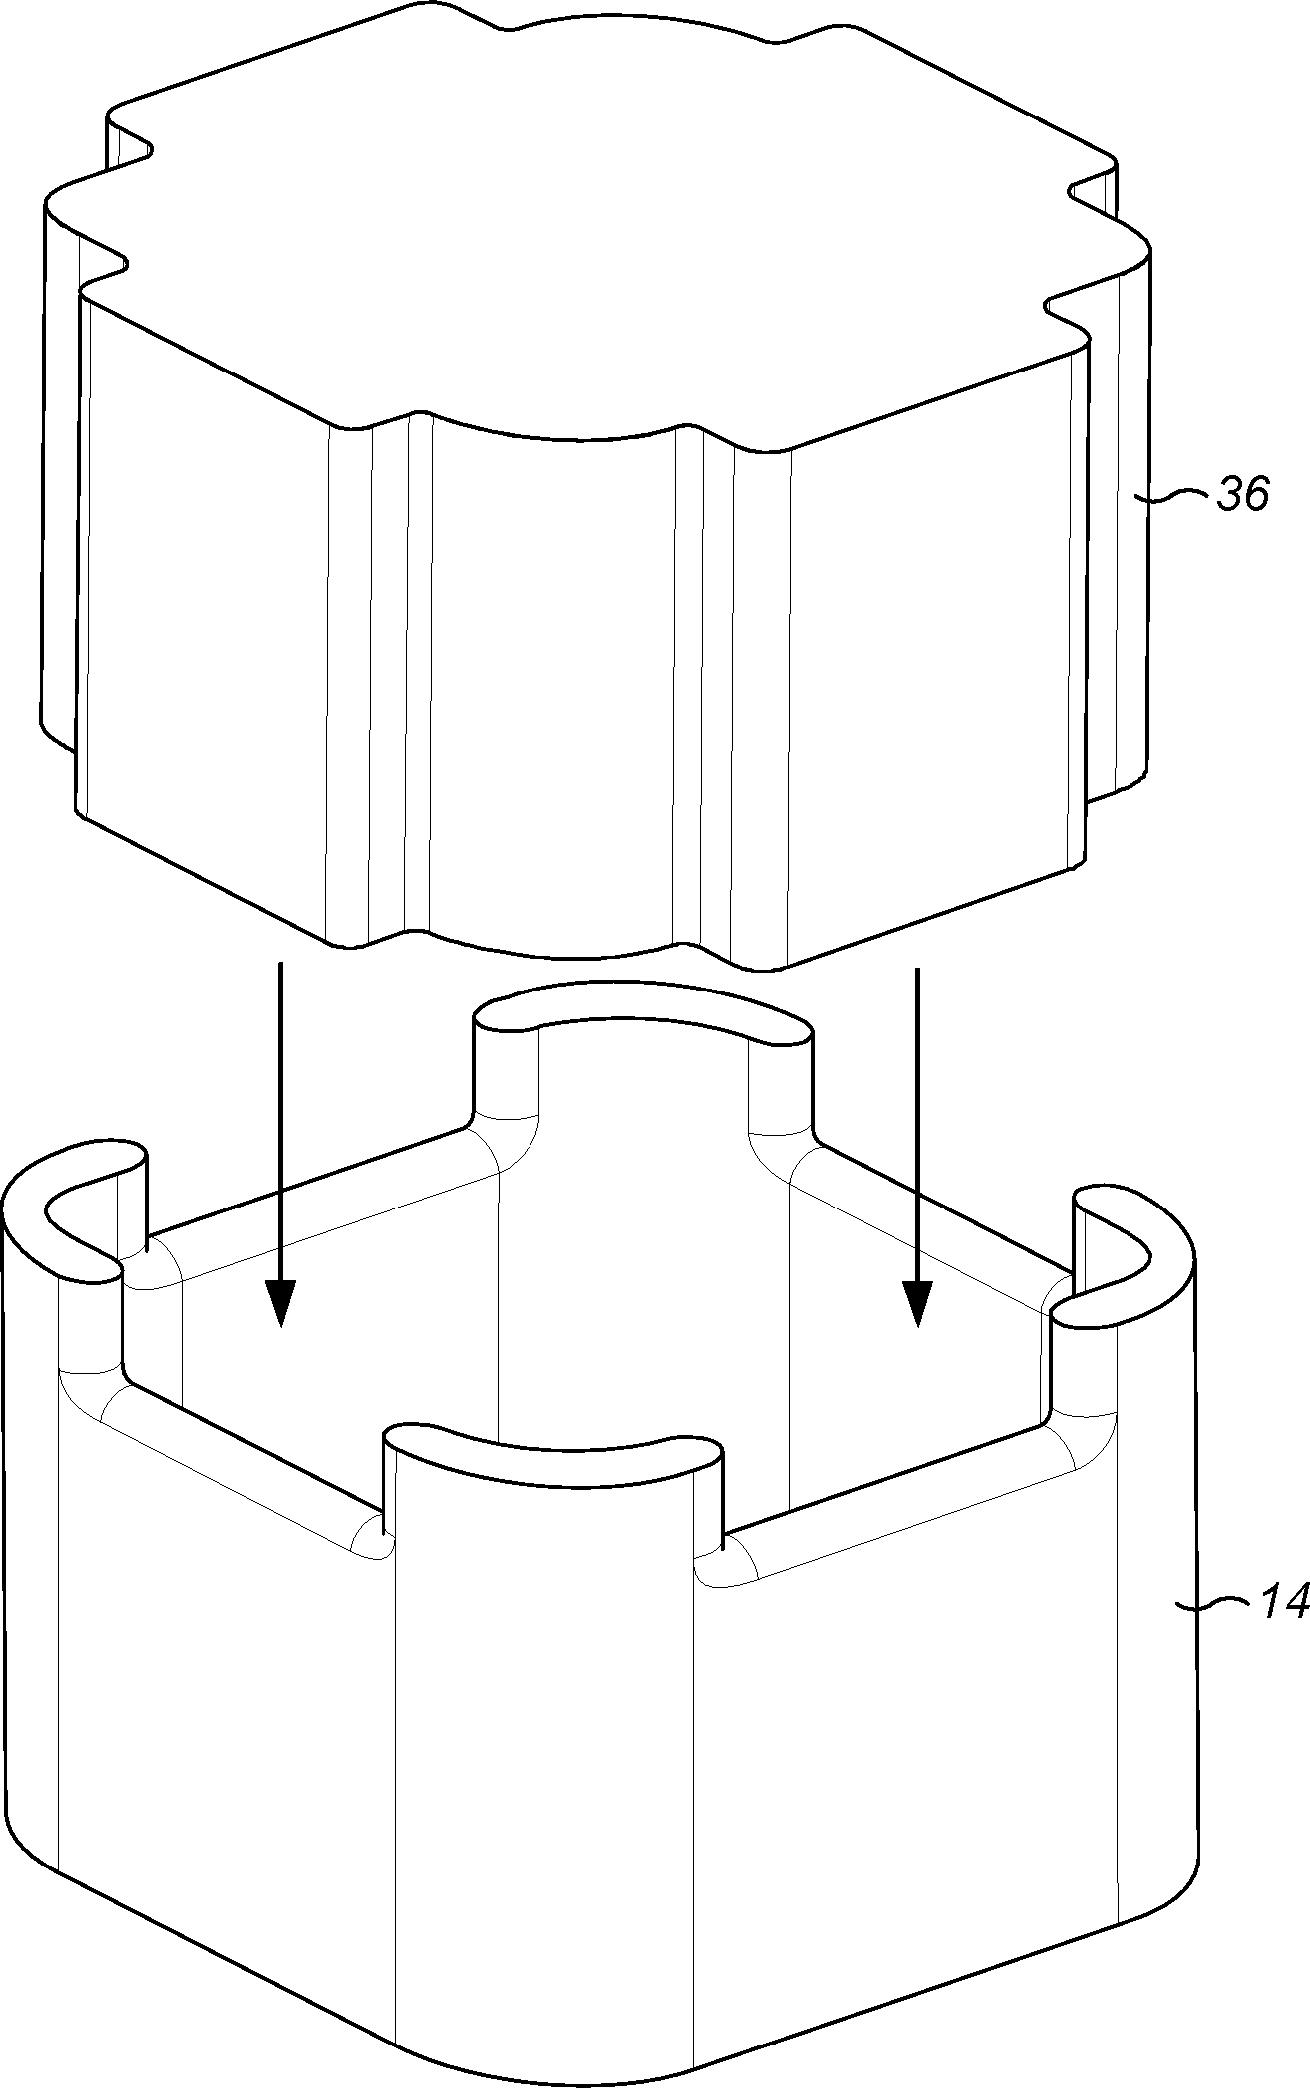 Figure GB2555832A_D0011